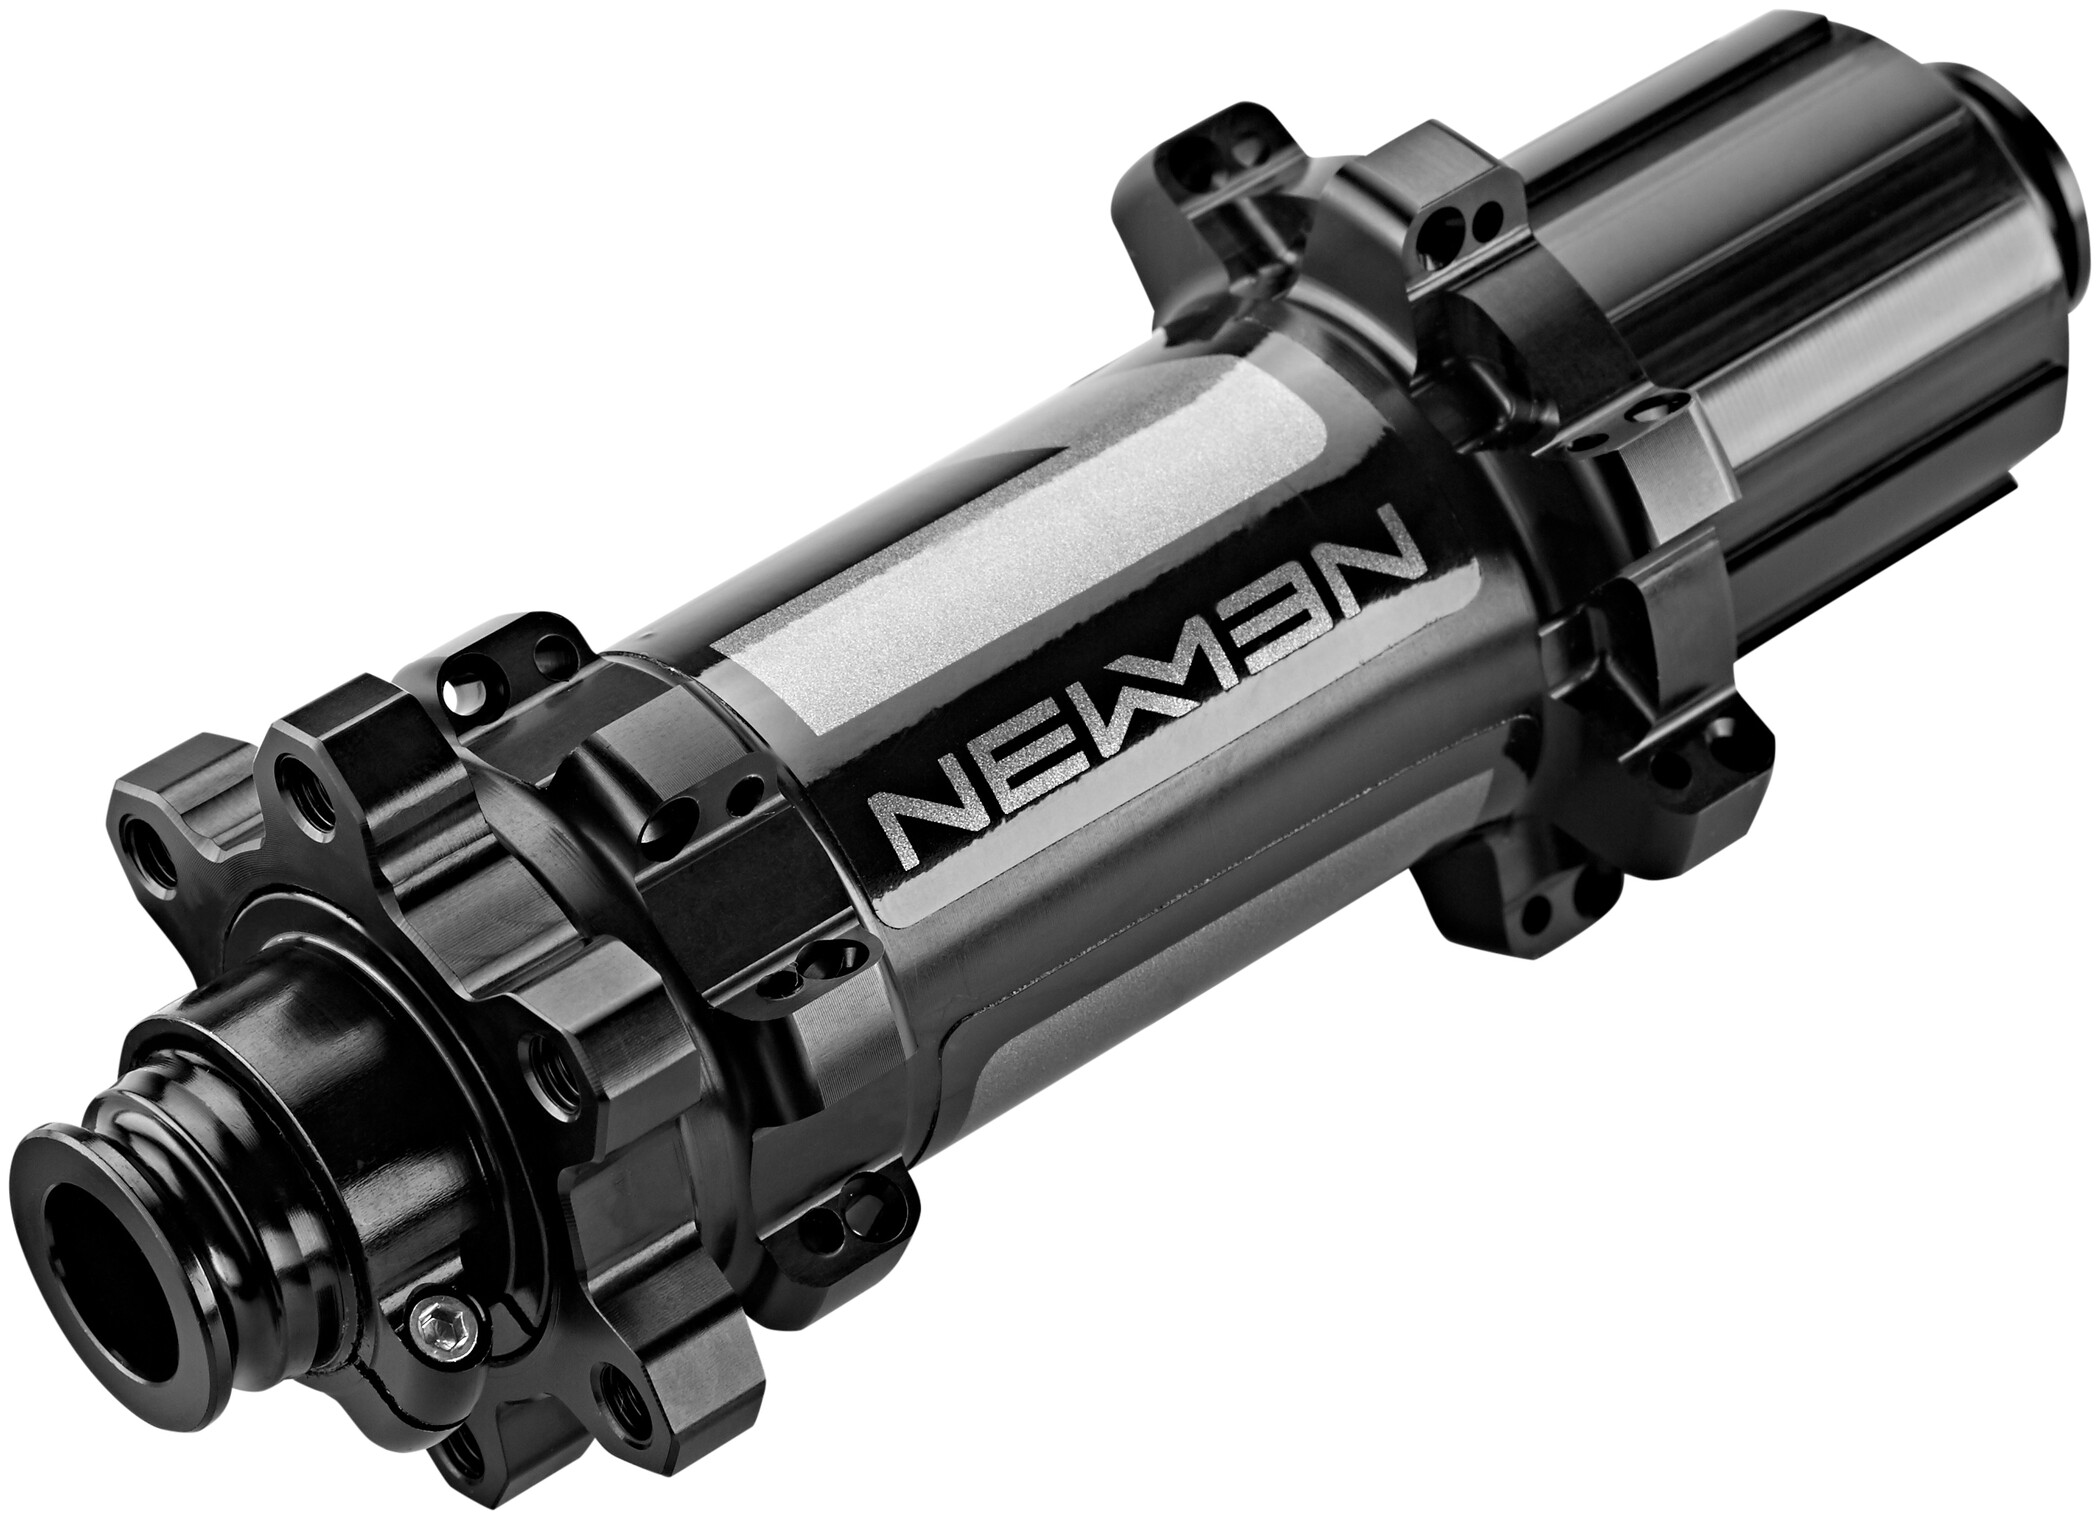 NEWMEN Evolution SL Rear Hub Disc 6Bolt Straight Pull 12x148mm Shimano | Hubs